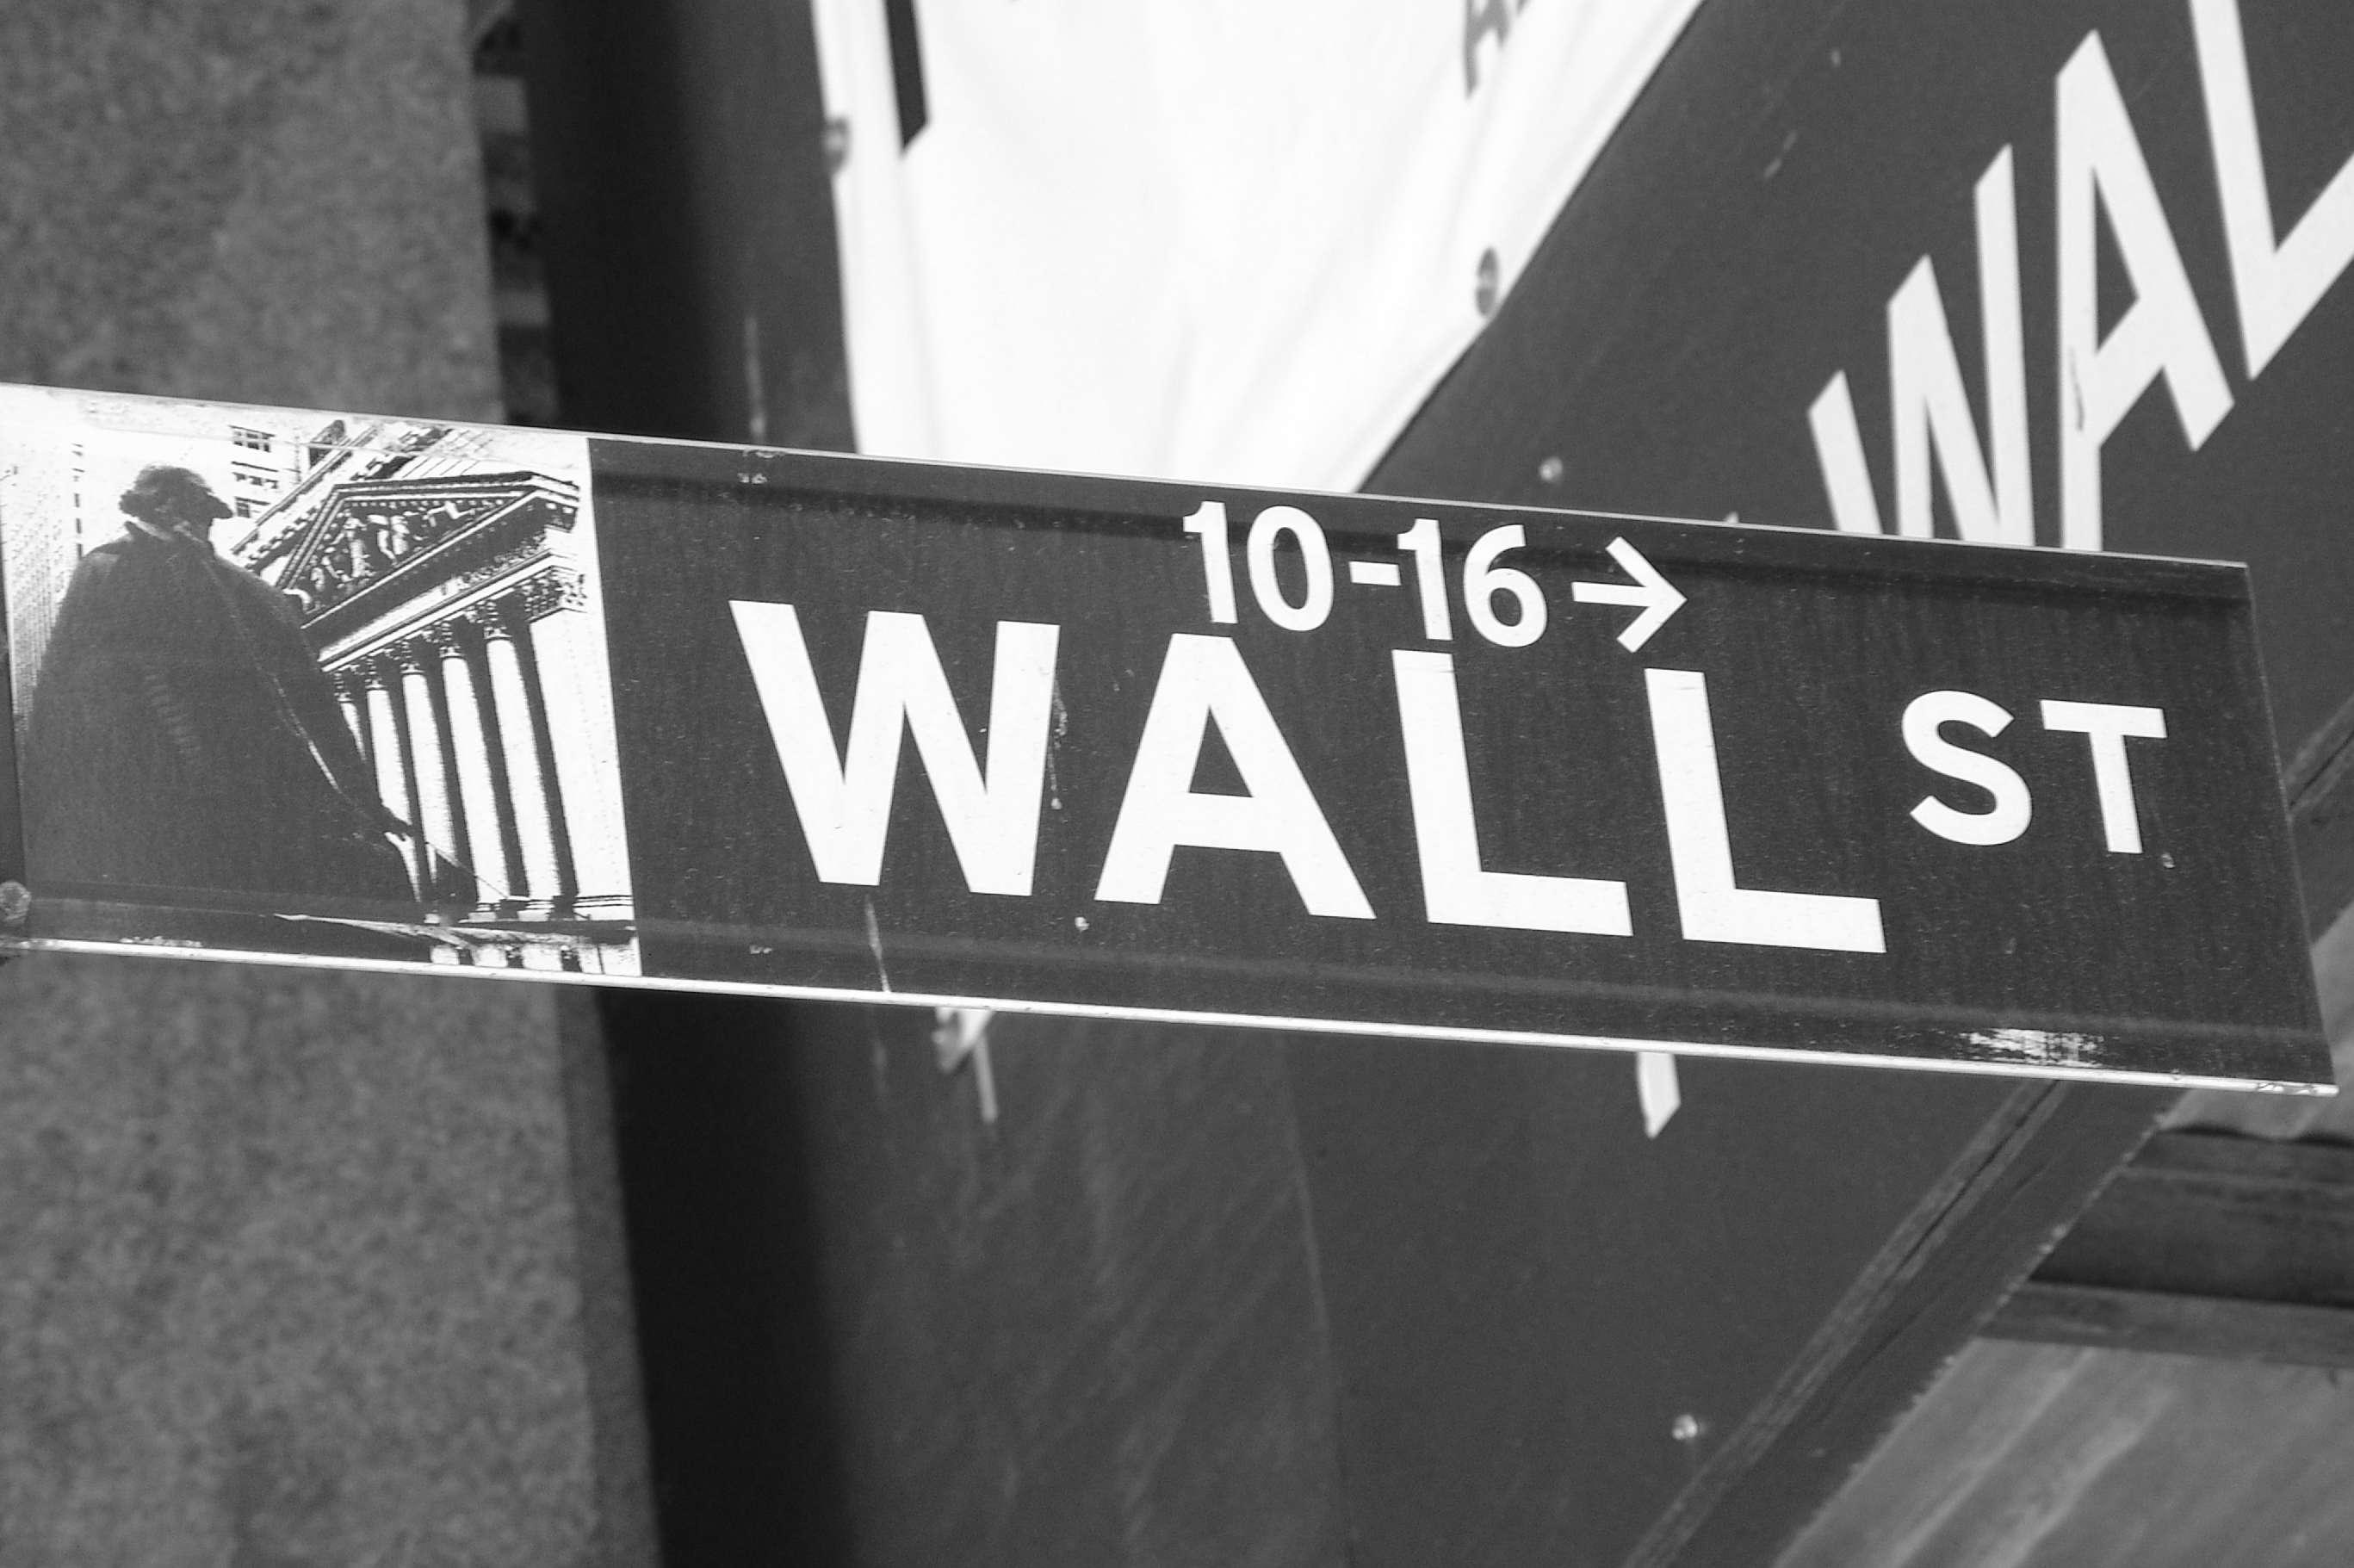 wallstreet4